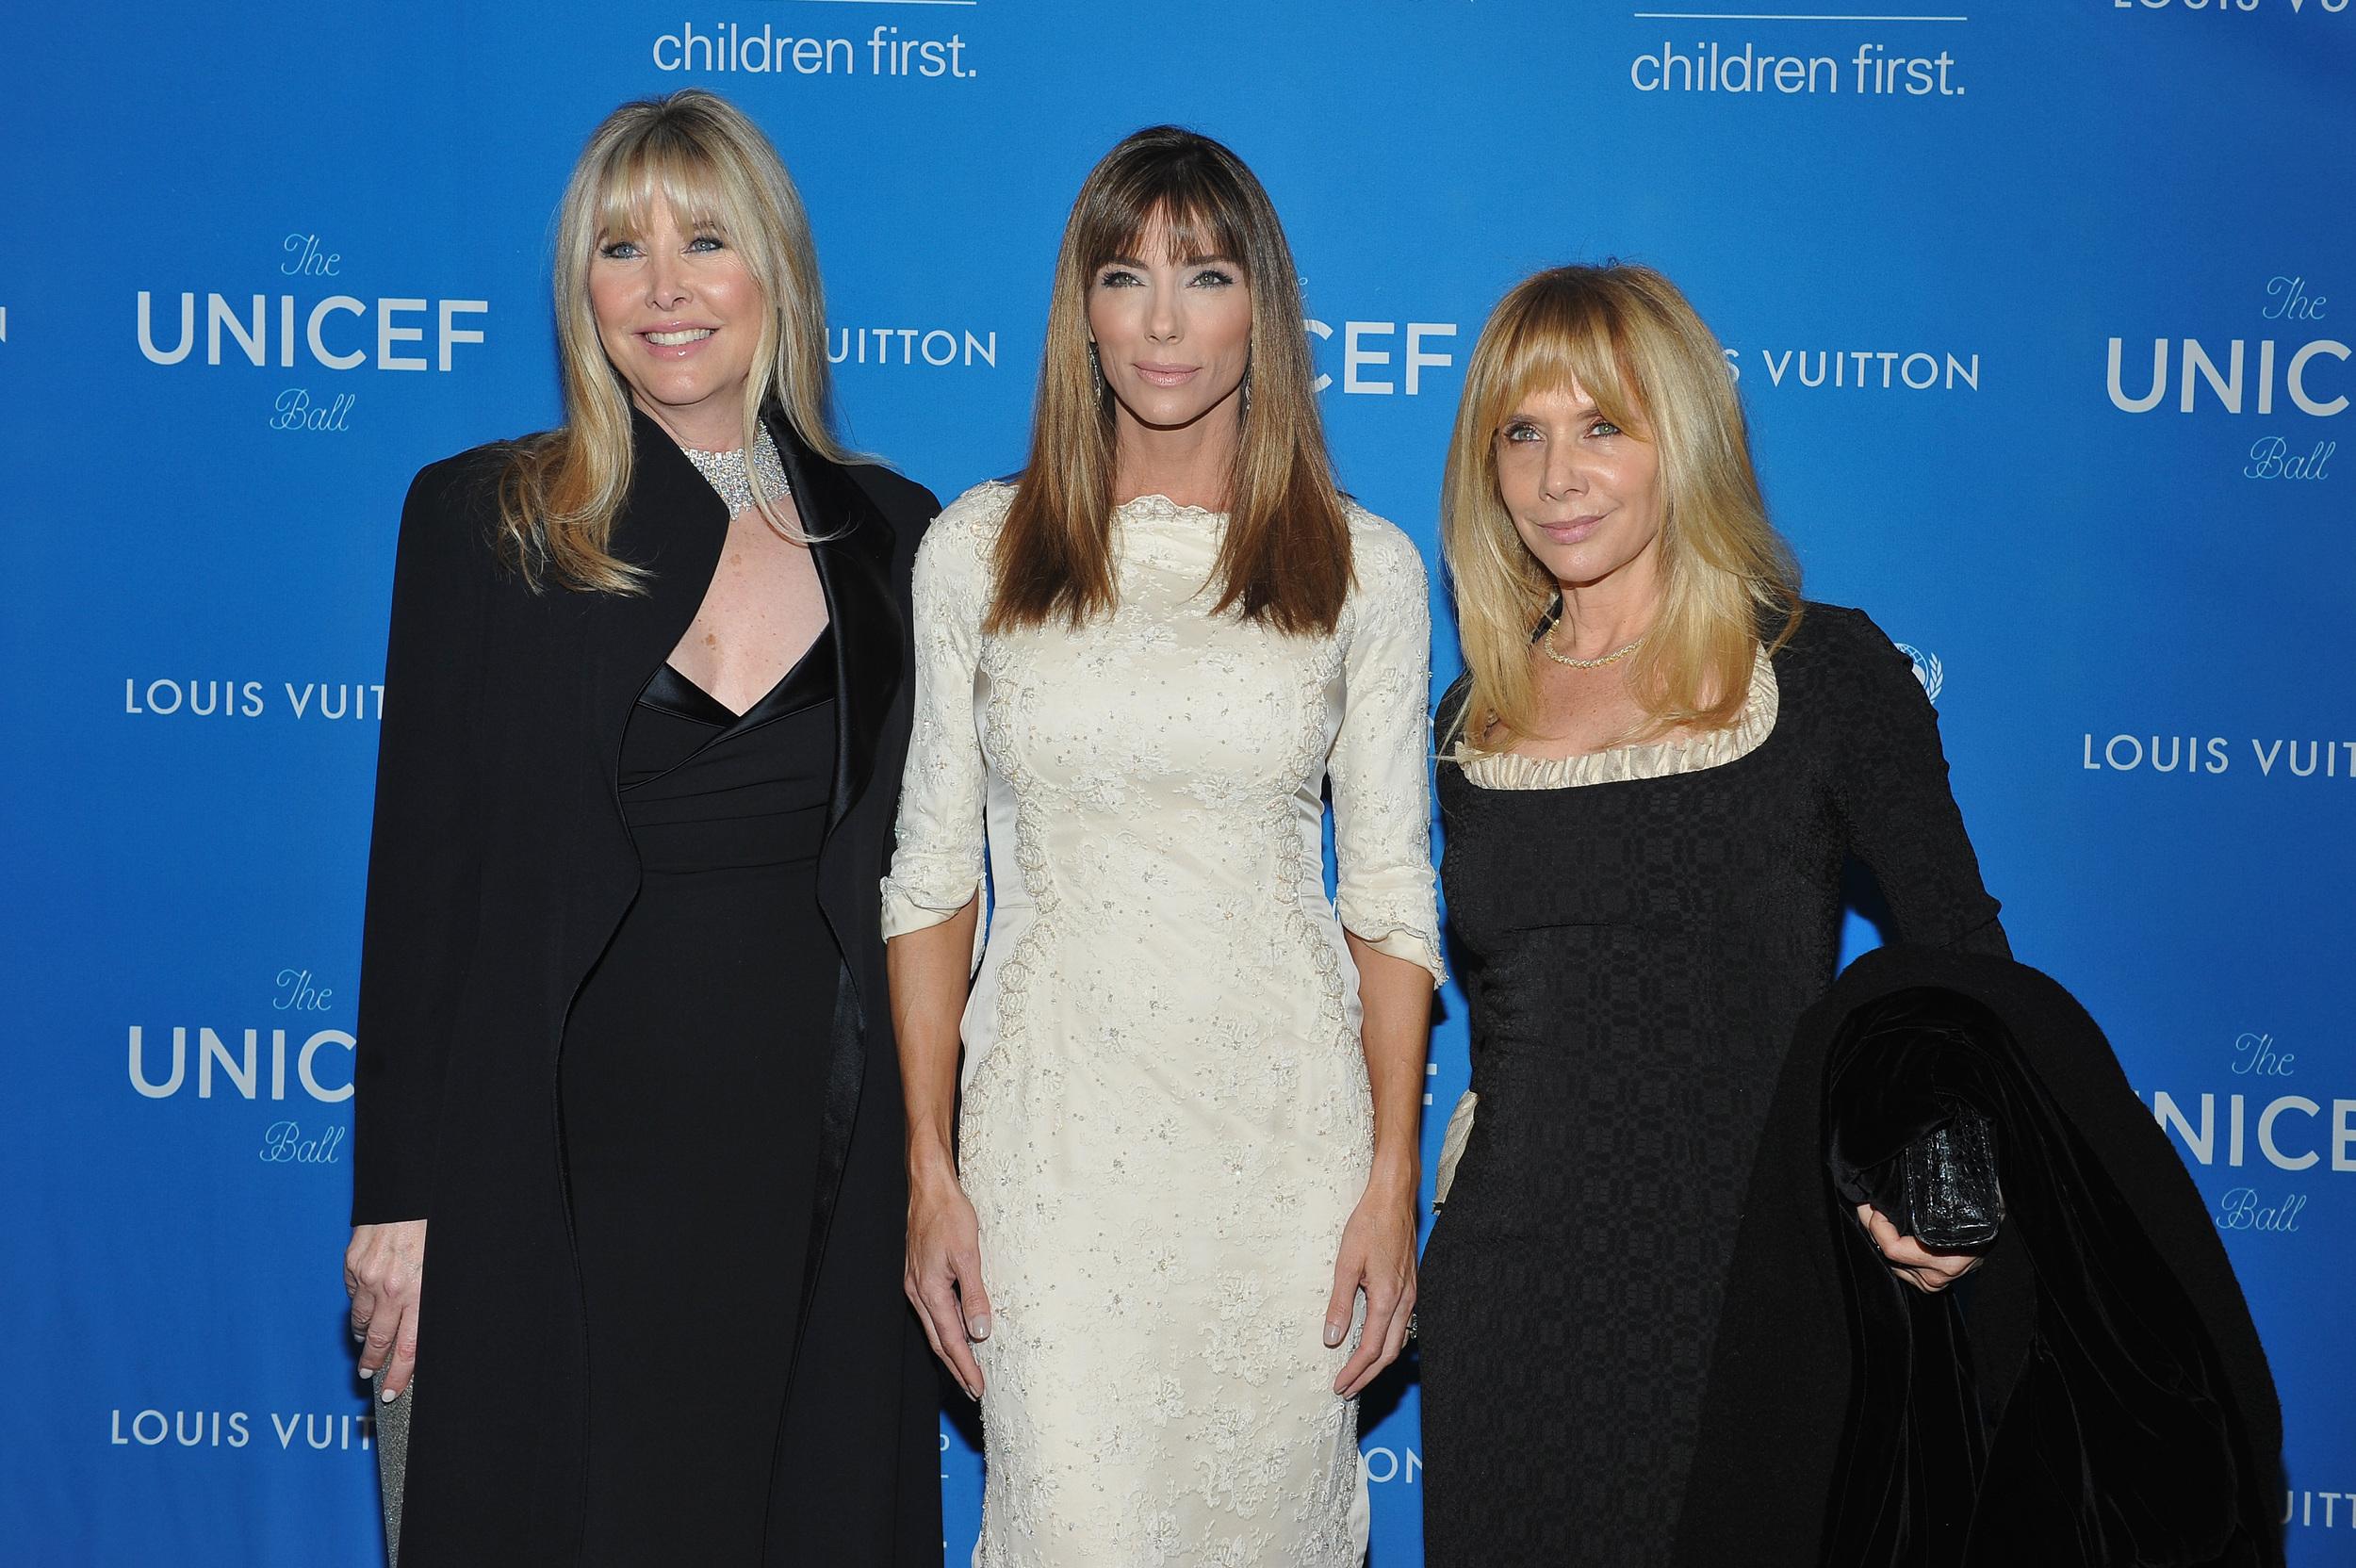 Irena Medavoy, Jennifer Flavin Stallone and Rosanna Arquette attend the 2016 UNICEF Ball